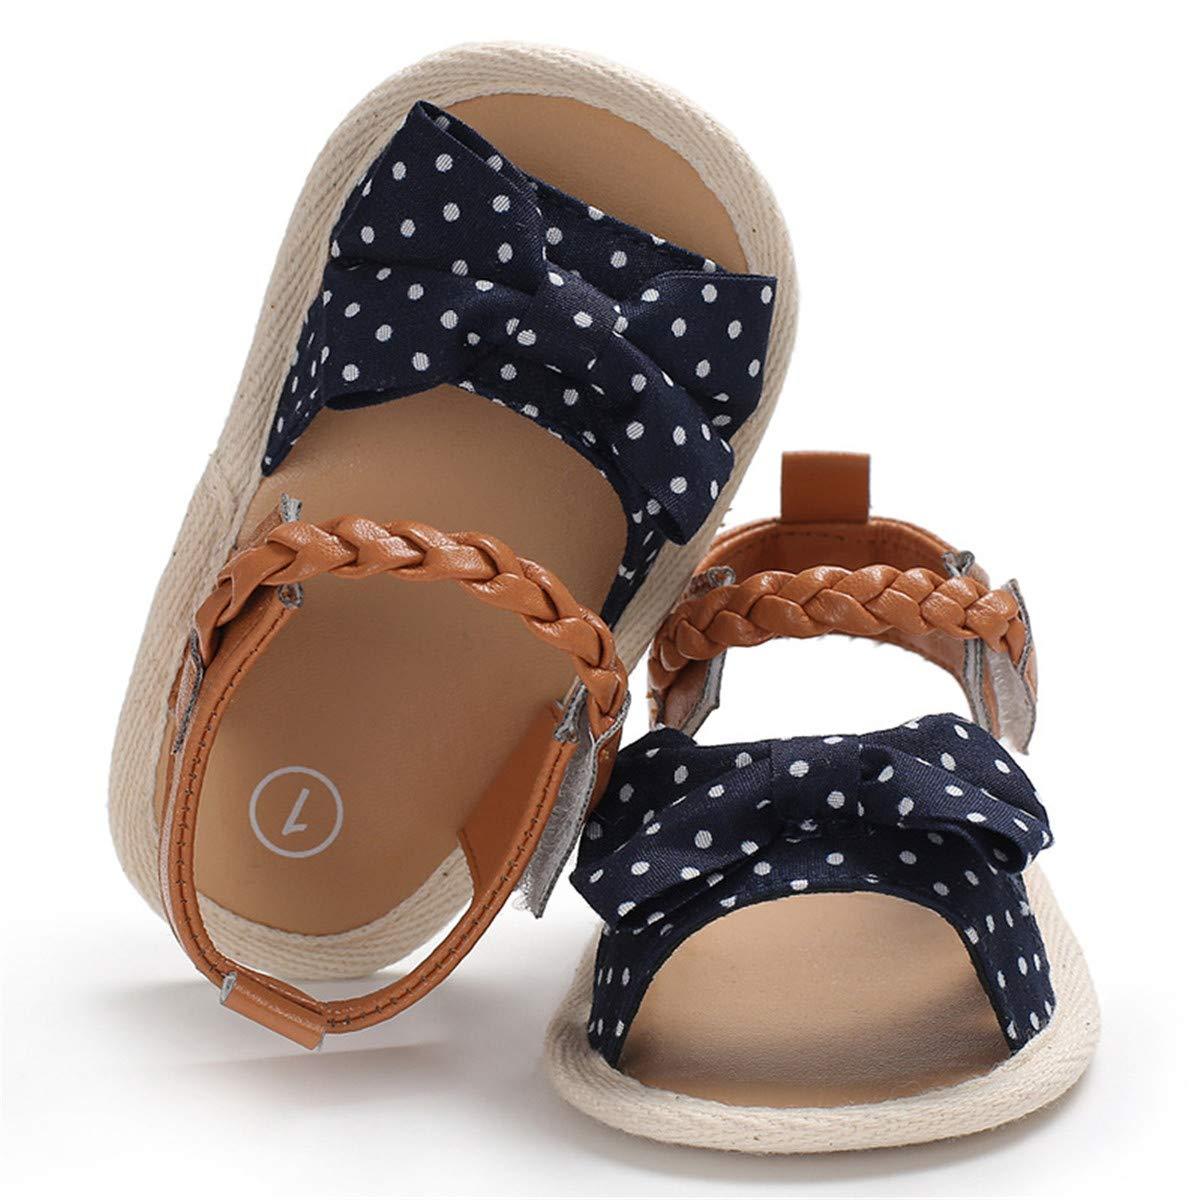 BEBARFER Infant Baby Girls Sandals T-Strap Flower Summer Shoes Anti-Slip Rubber Sole Toddler First Walker Crib Shoes